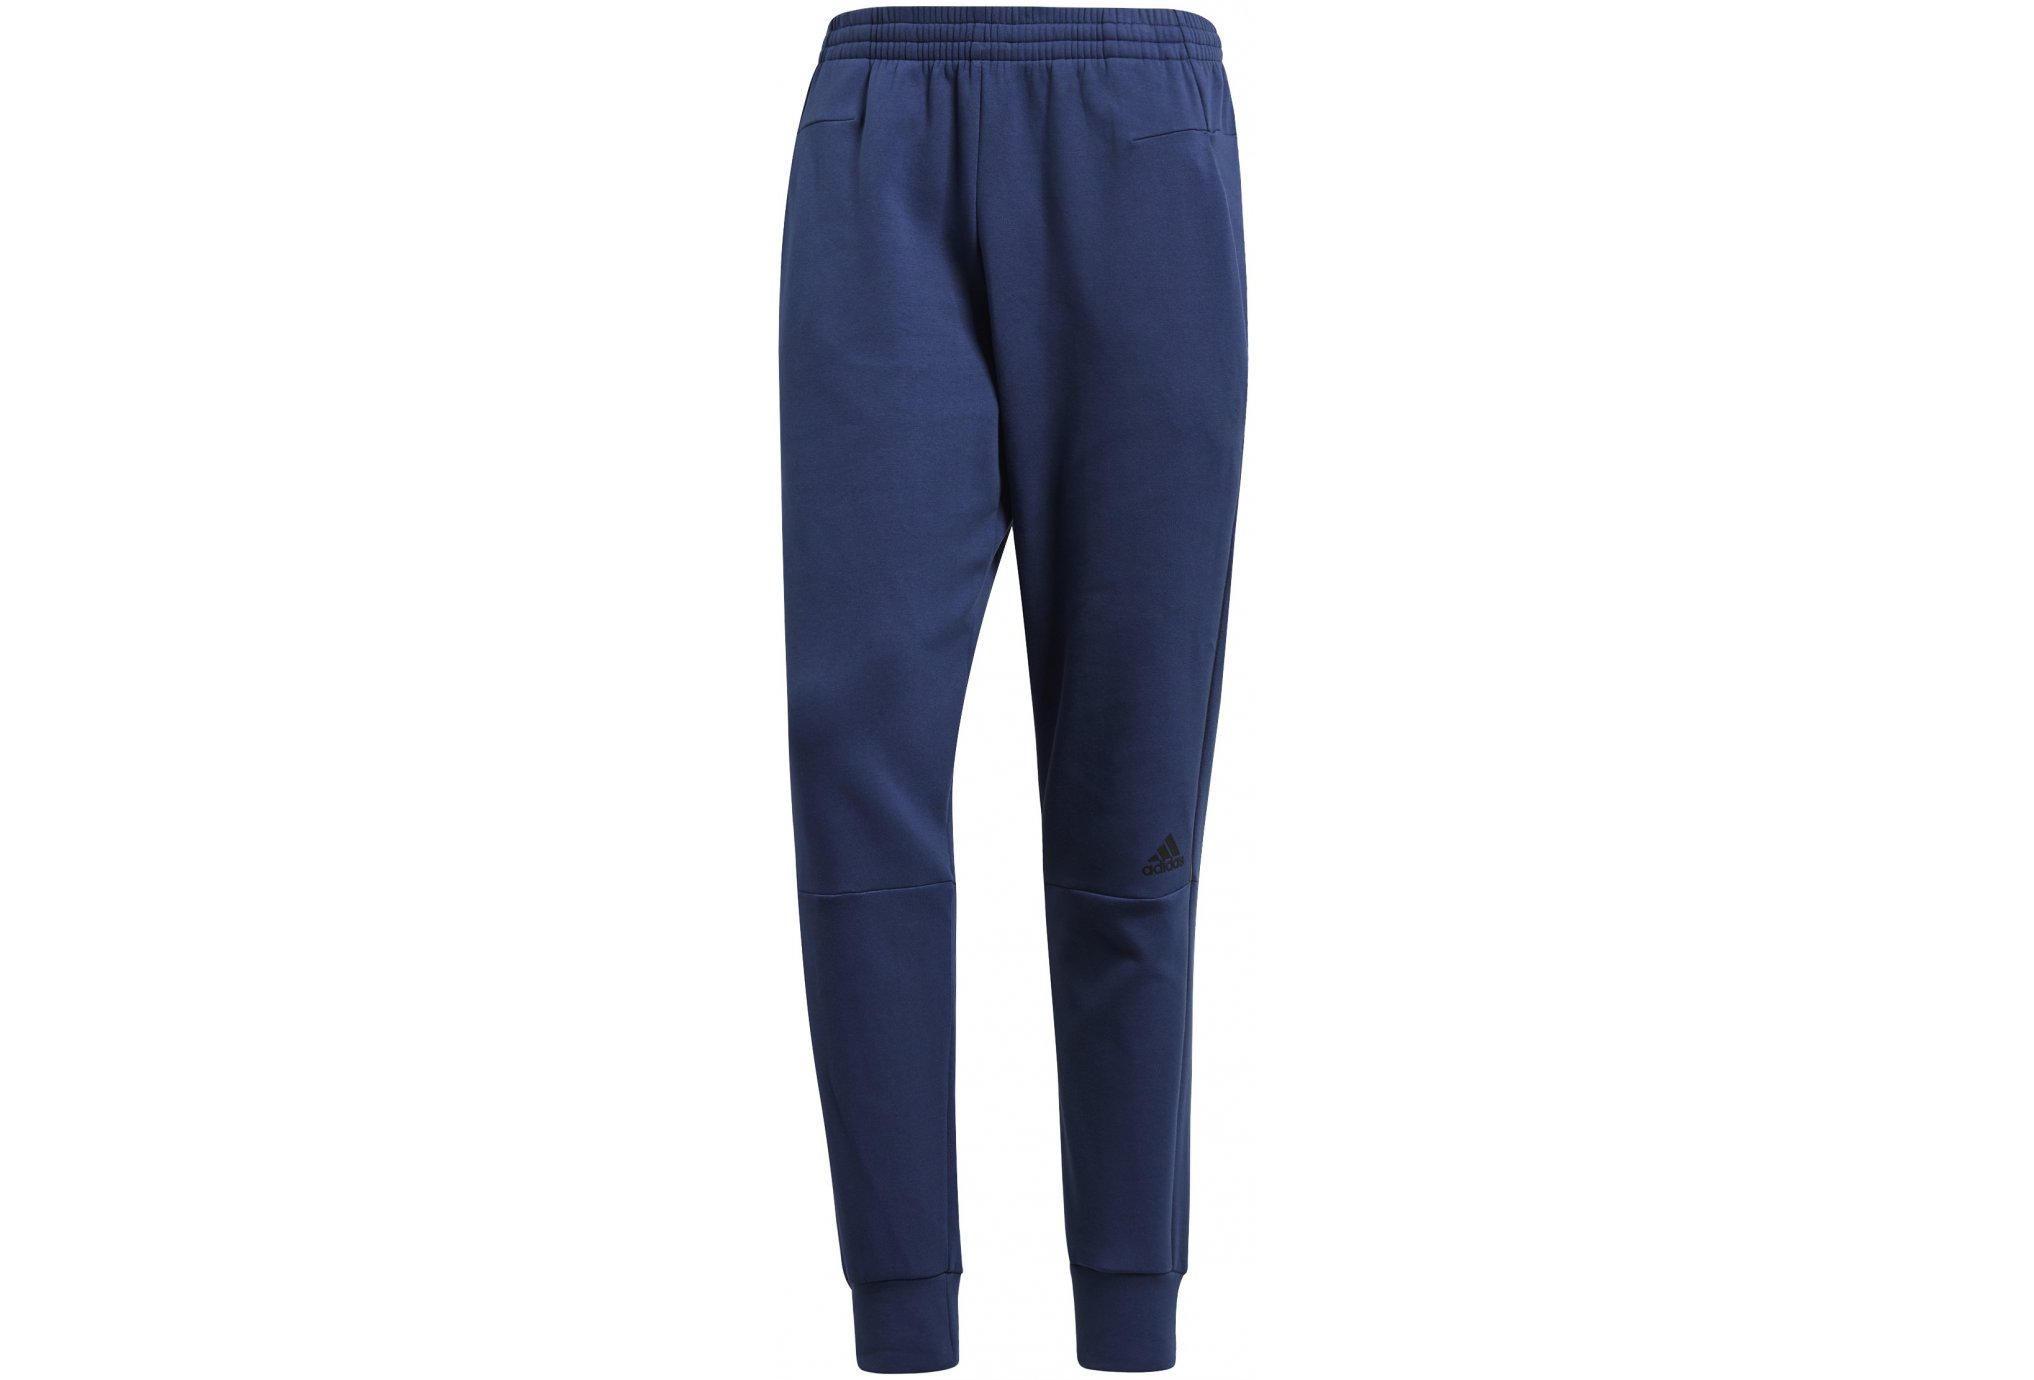 Adidas Z.N.e. striker m vêtement running homme